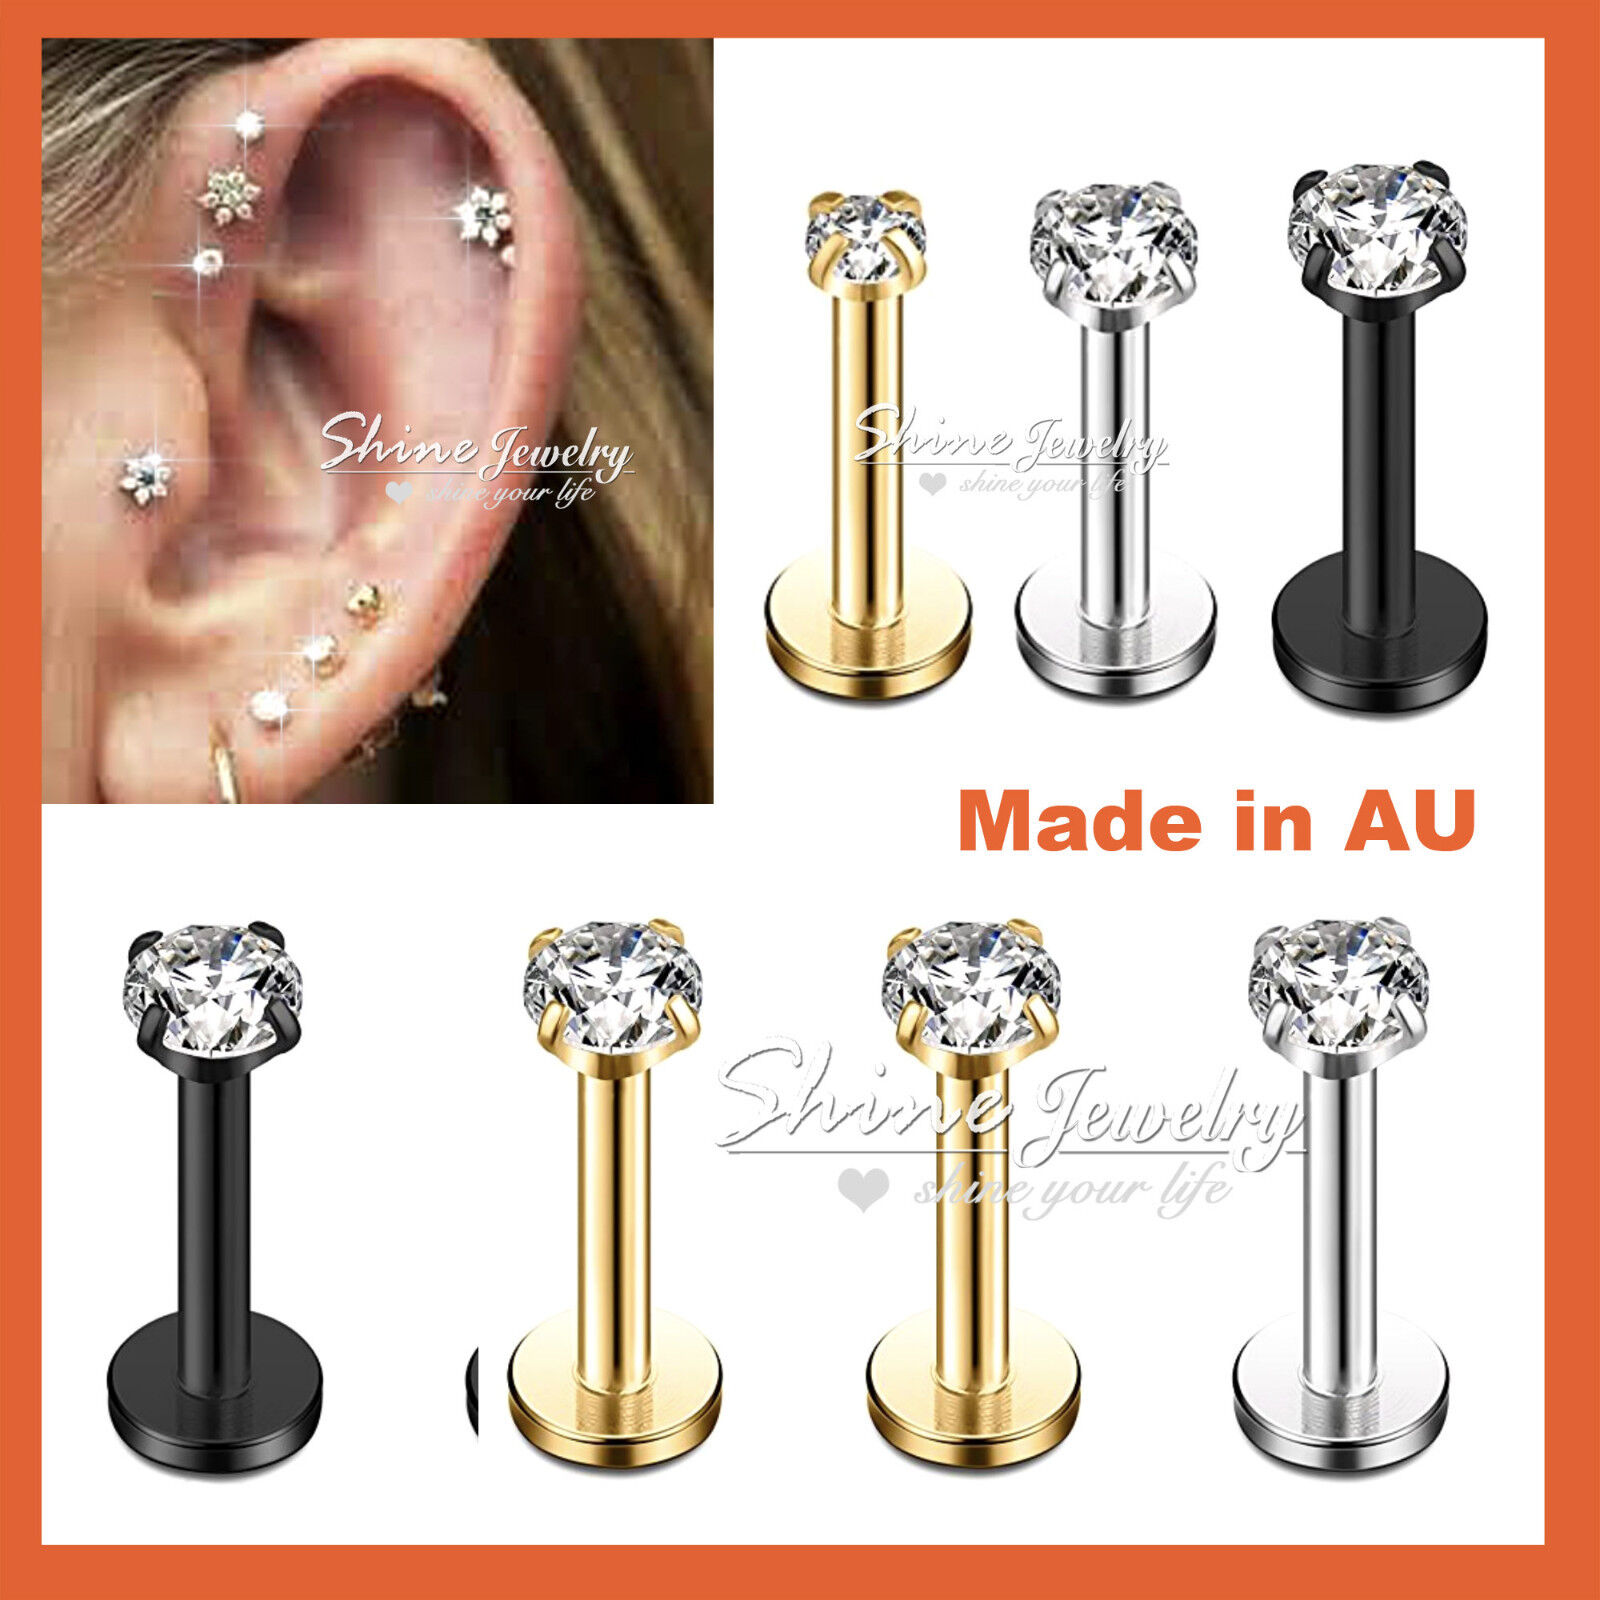 Jewellery - Titanium Ear Helix Tragus Cartilage Earring Lip Crystal Bar Stud Body Piercing